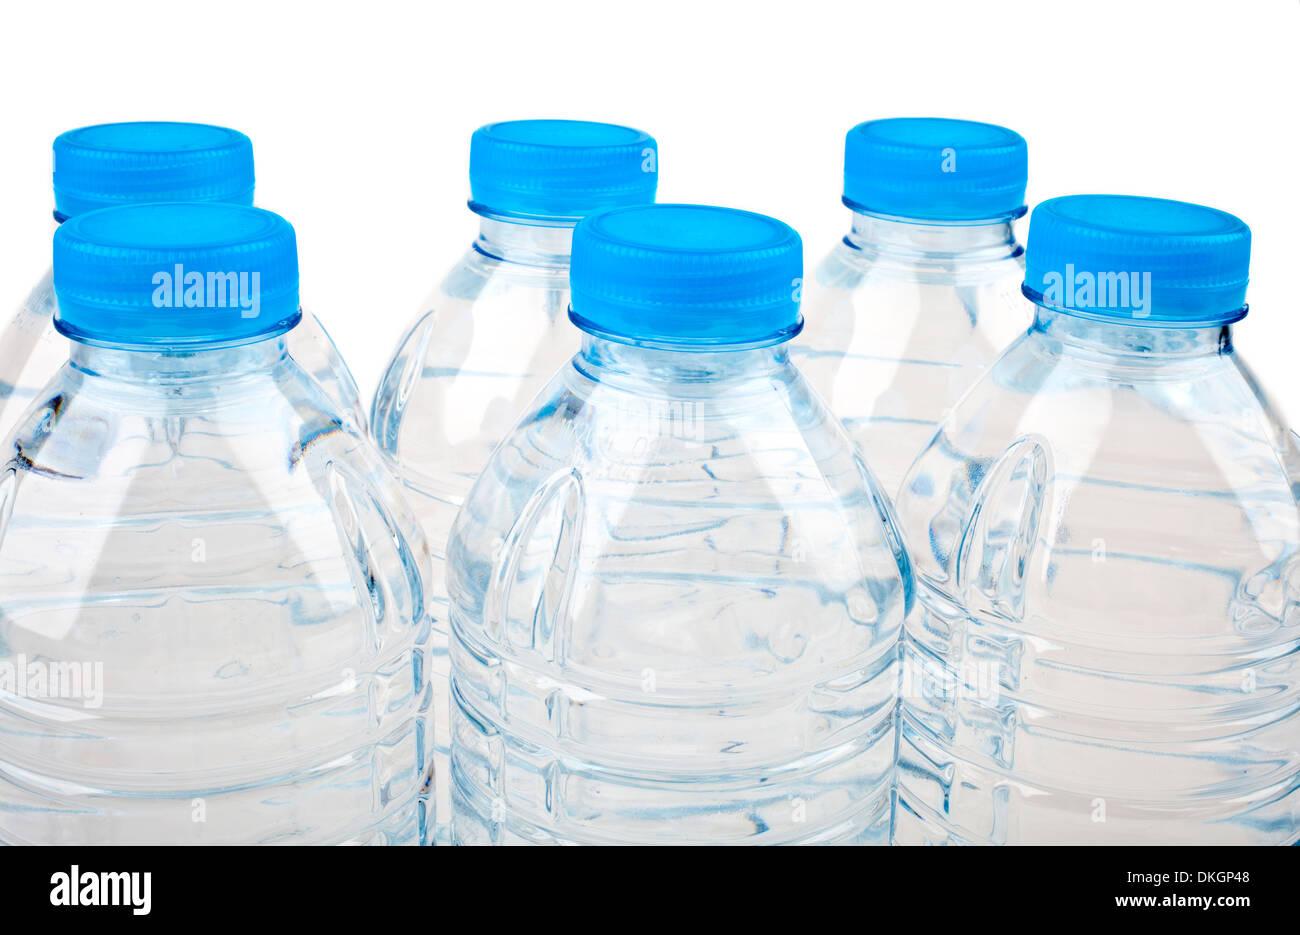 Botellas de agua sobre un fondo blanco. Imagen De Stock